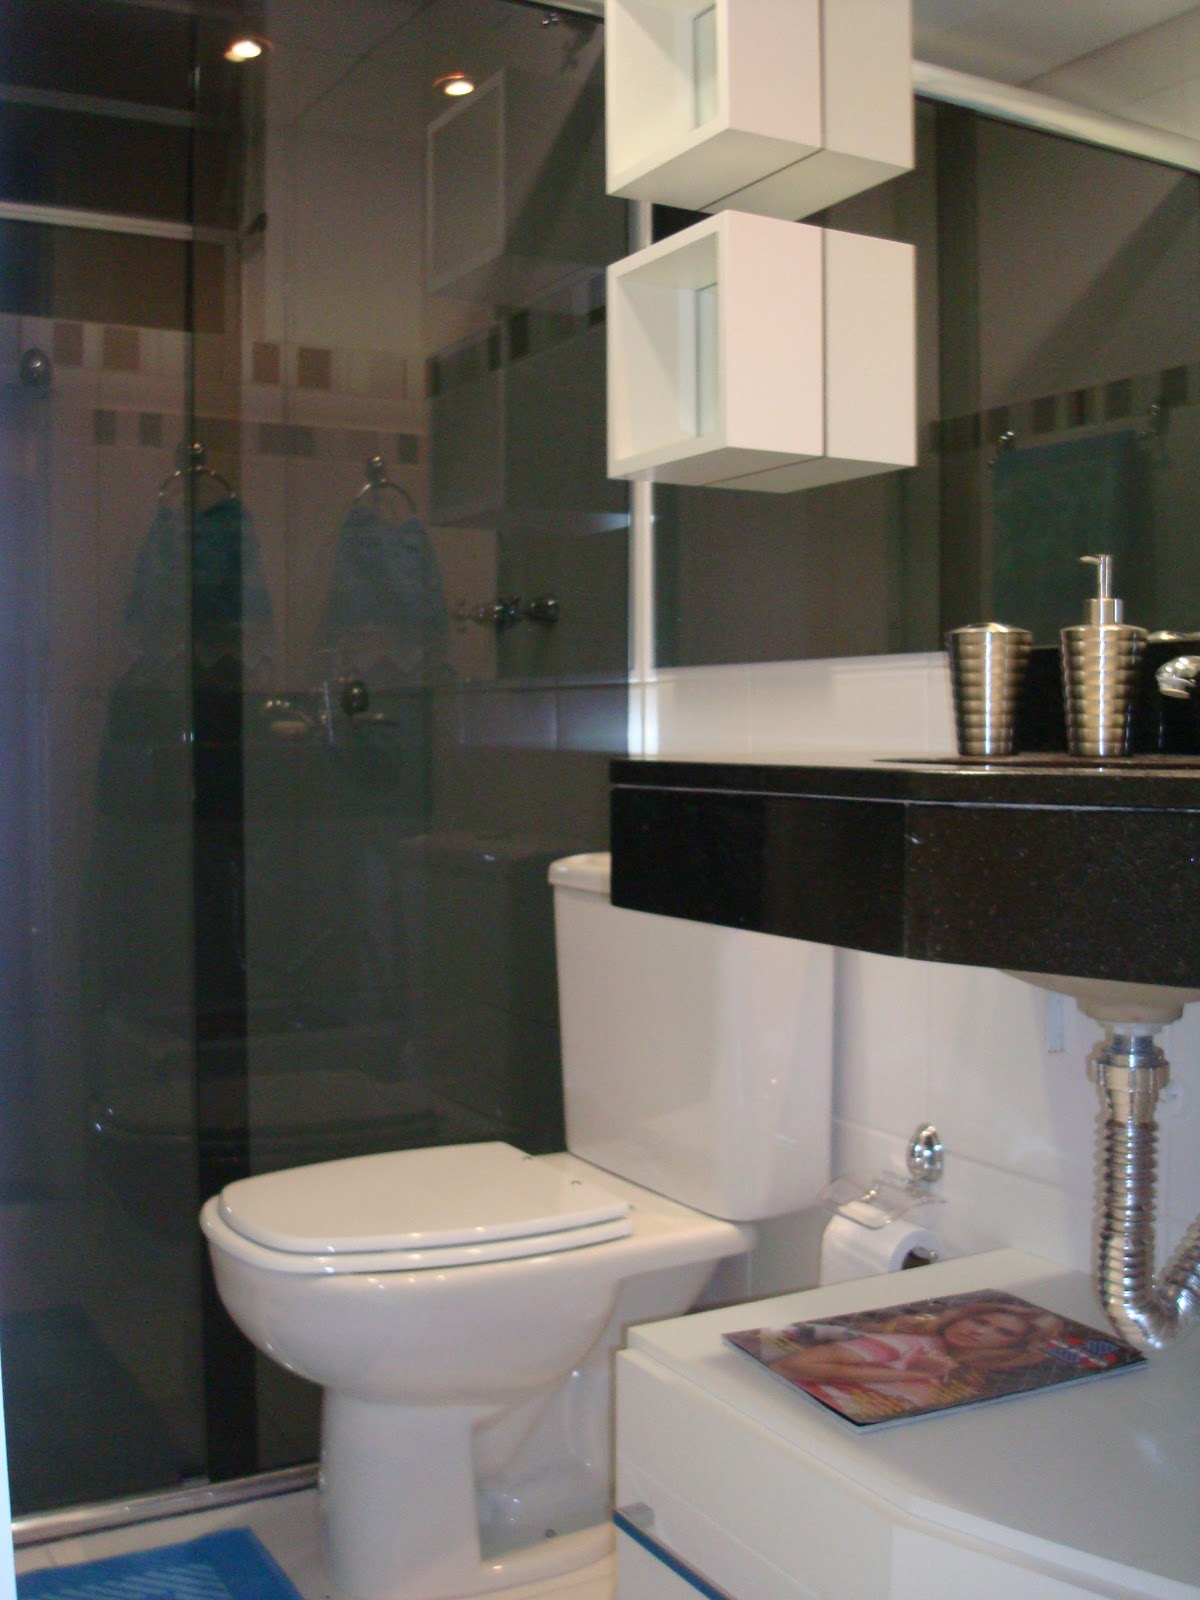 Daiane Manica Abril 2011 -> Banheiro Pequeno Comprido